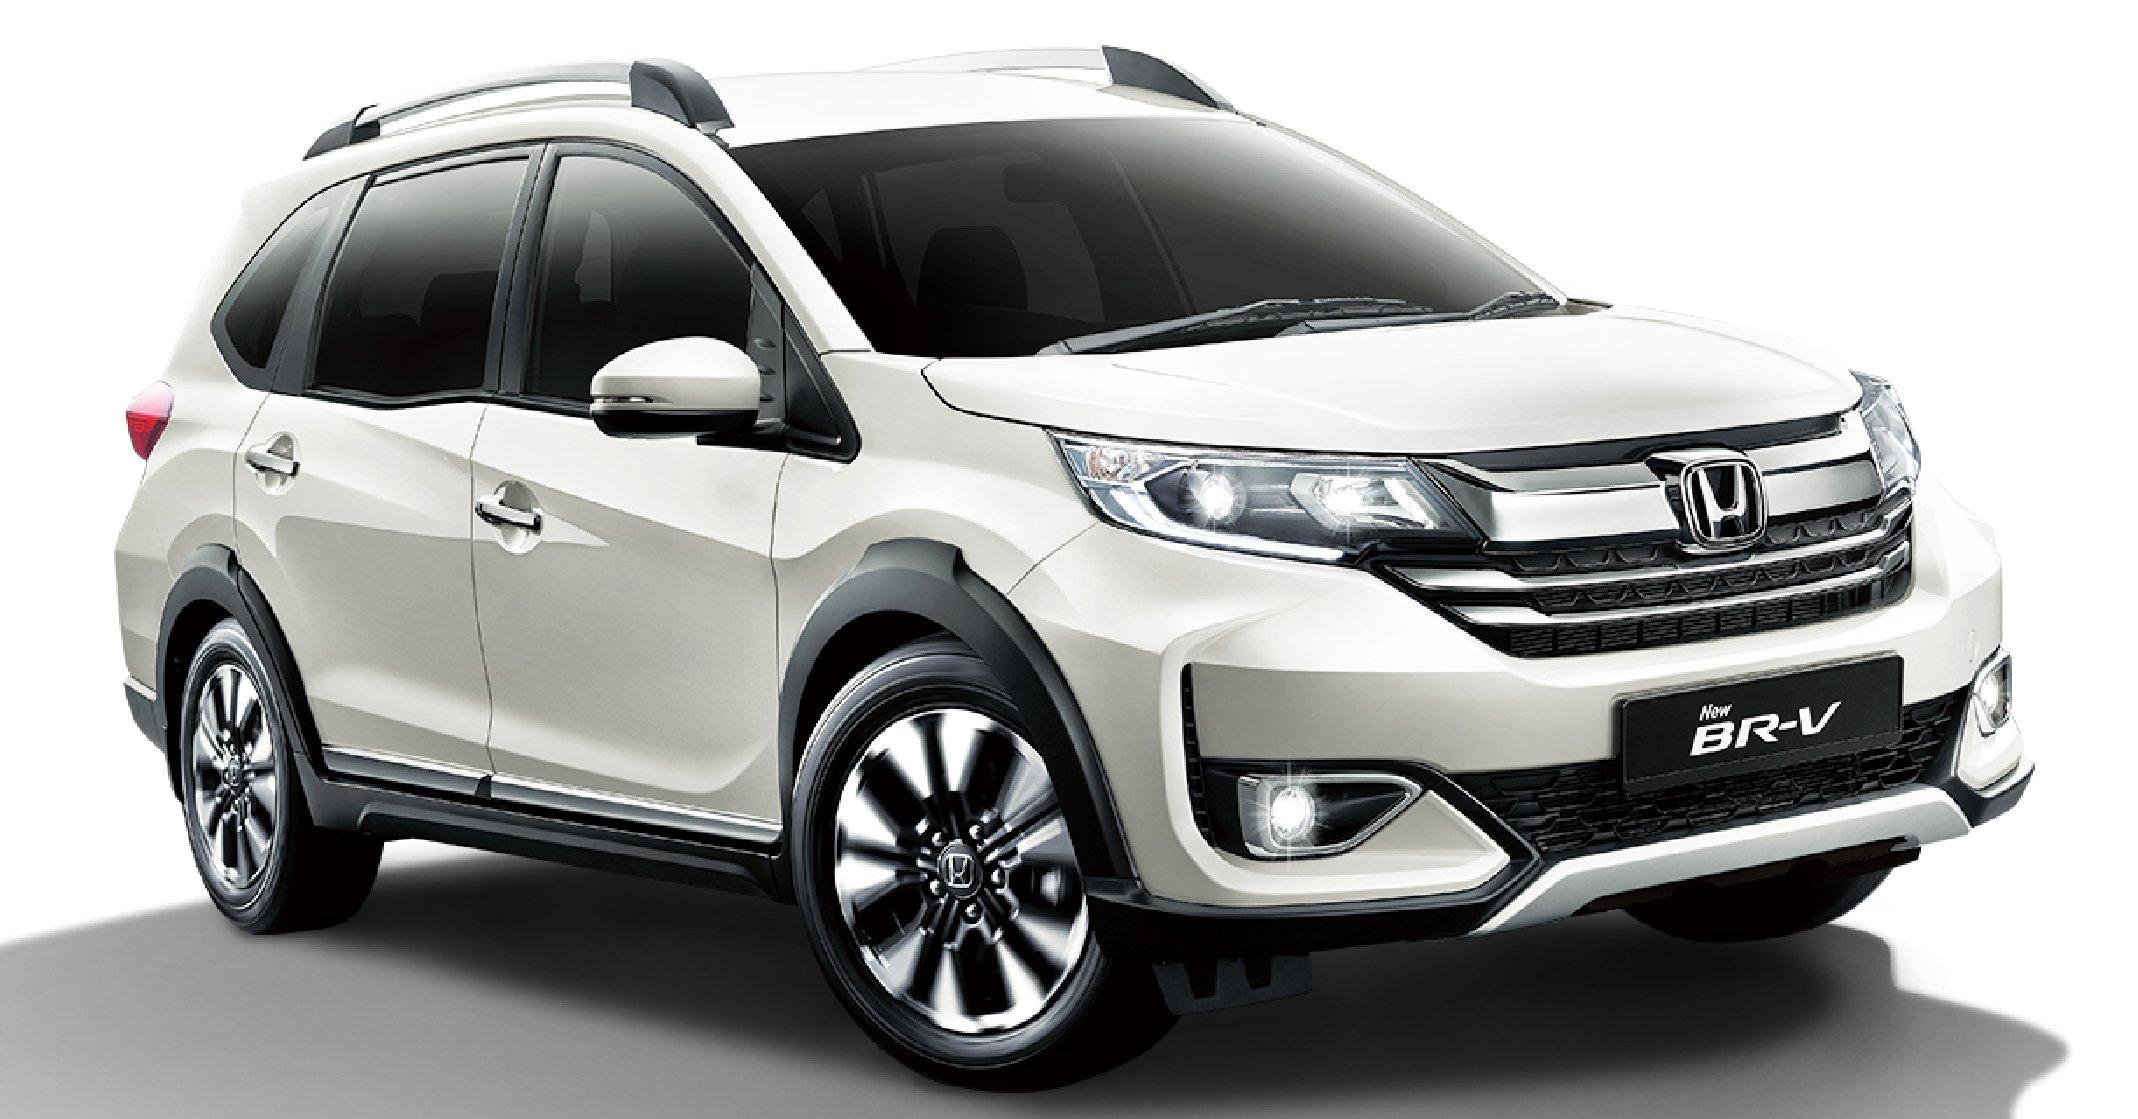 2020 Honda BR-V facelift launched in M'sia, fr RM90k 2020 Honda BR-V Facelift - Paul Tan's ...